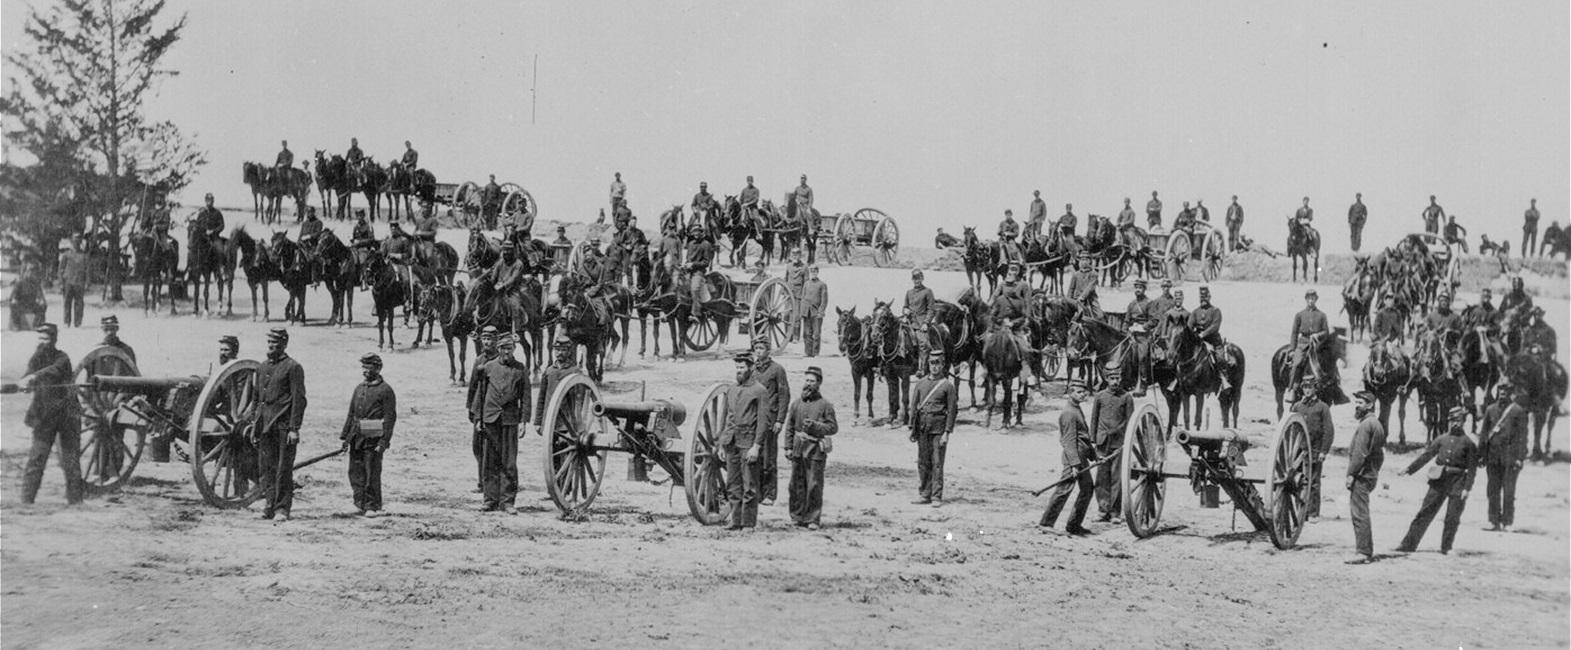 civil war_1865.jpg